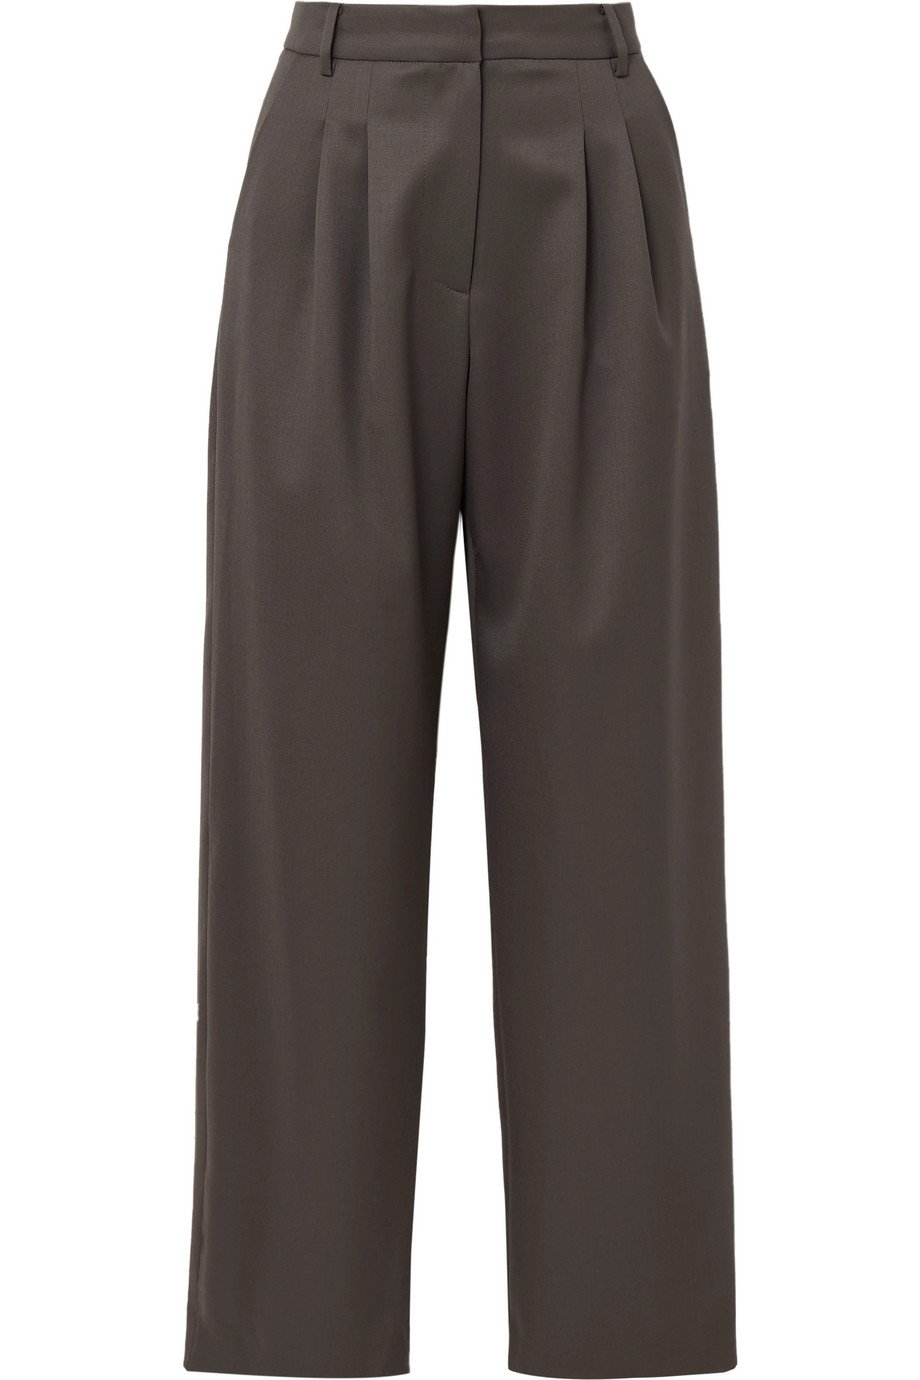 LOW CLASSIC | Wool-blend wide-leg pants | NET-A-PORTER.COM